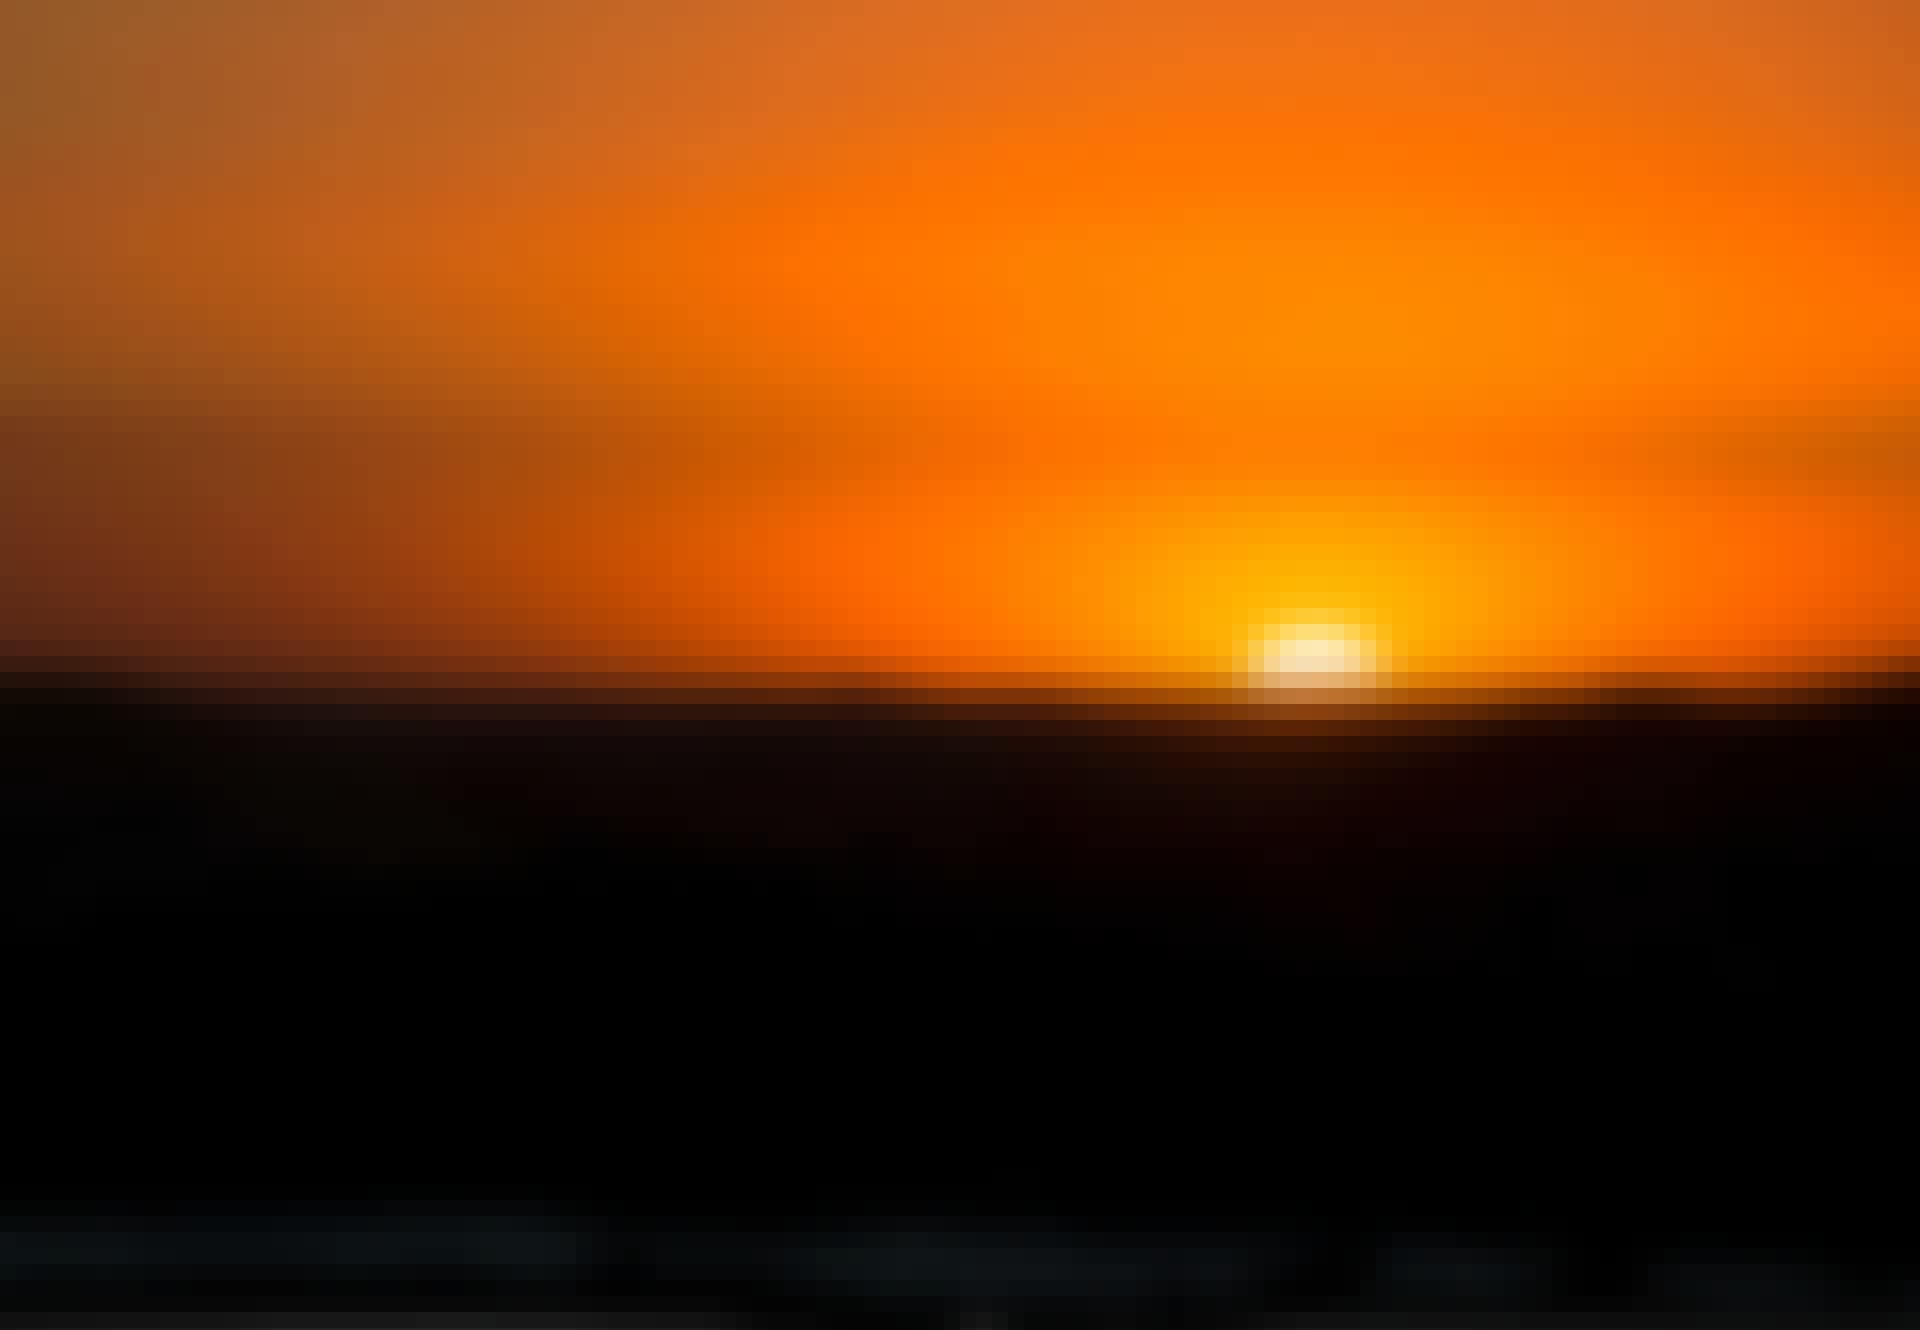 Kesäaika - auringonnousu